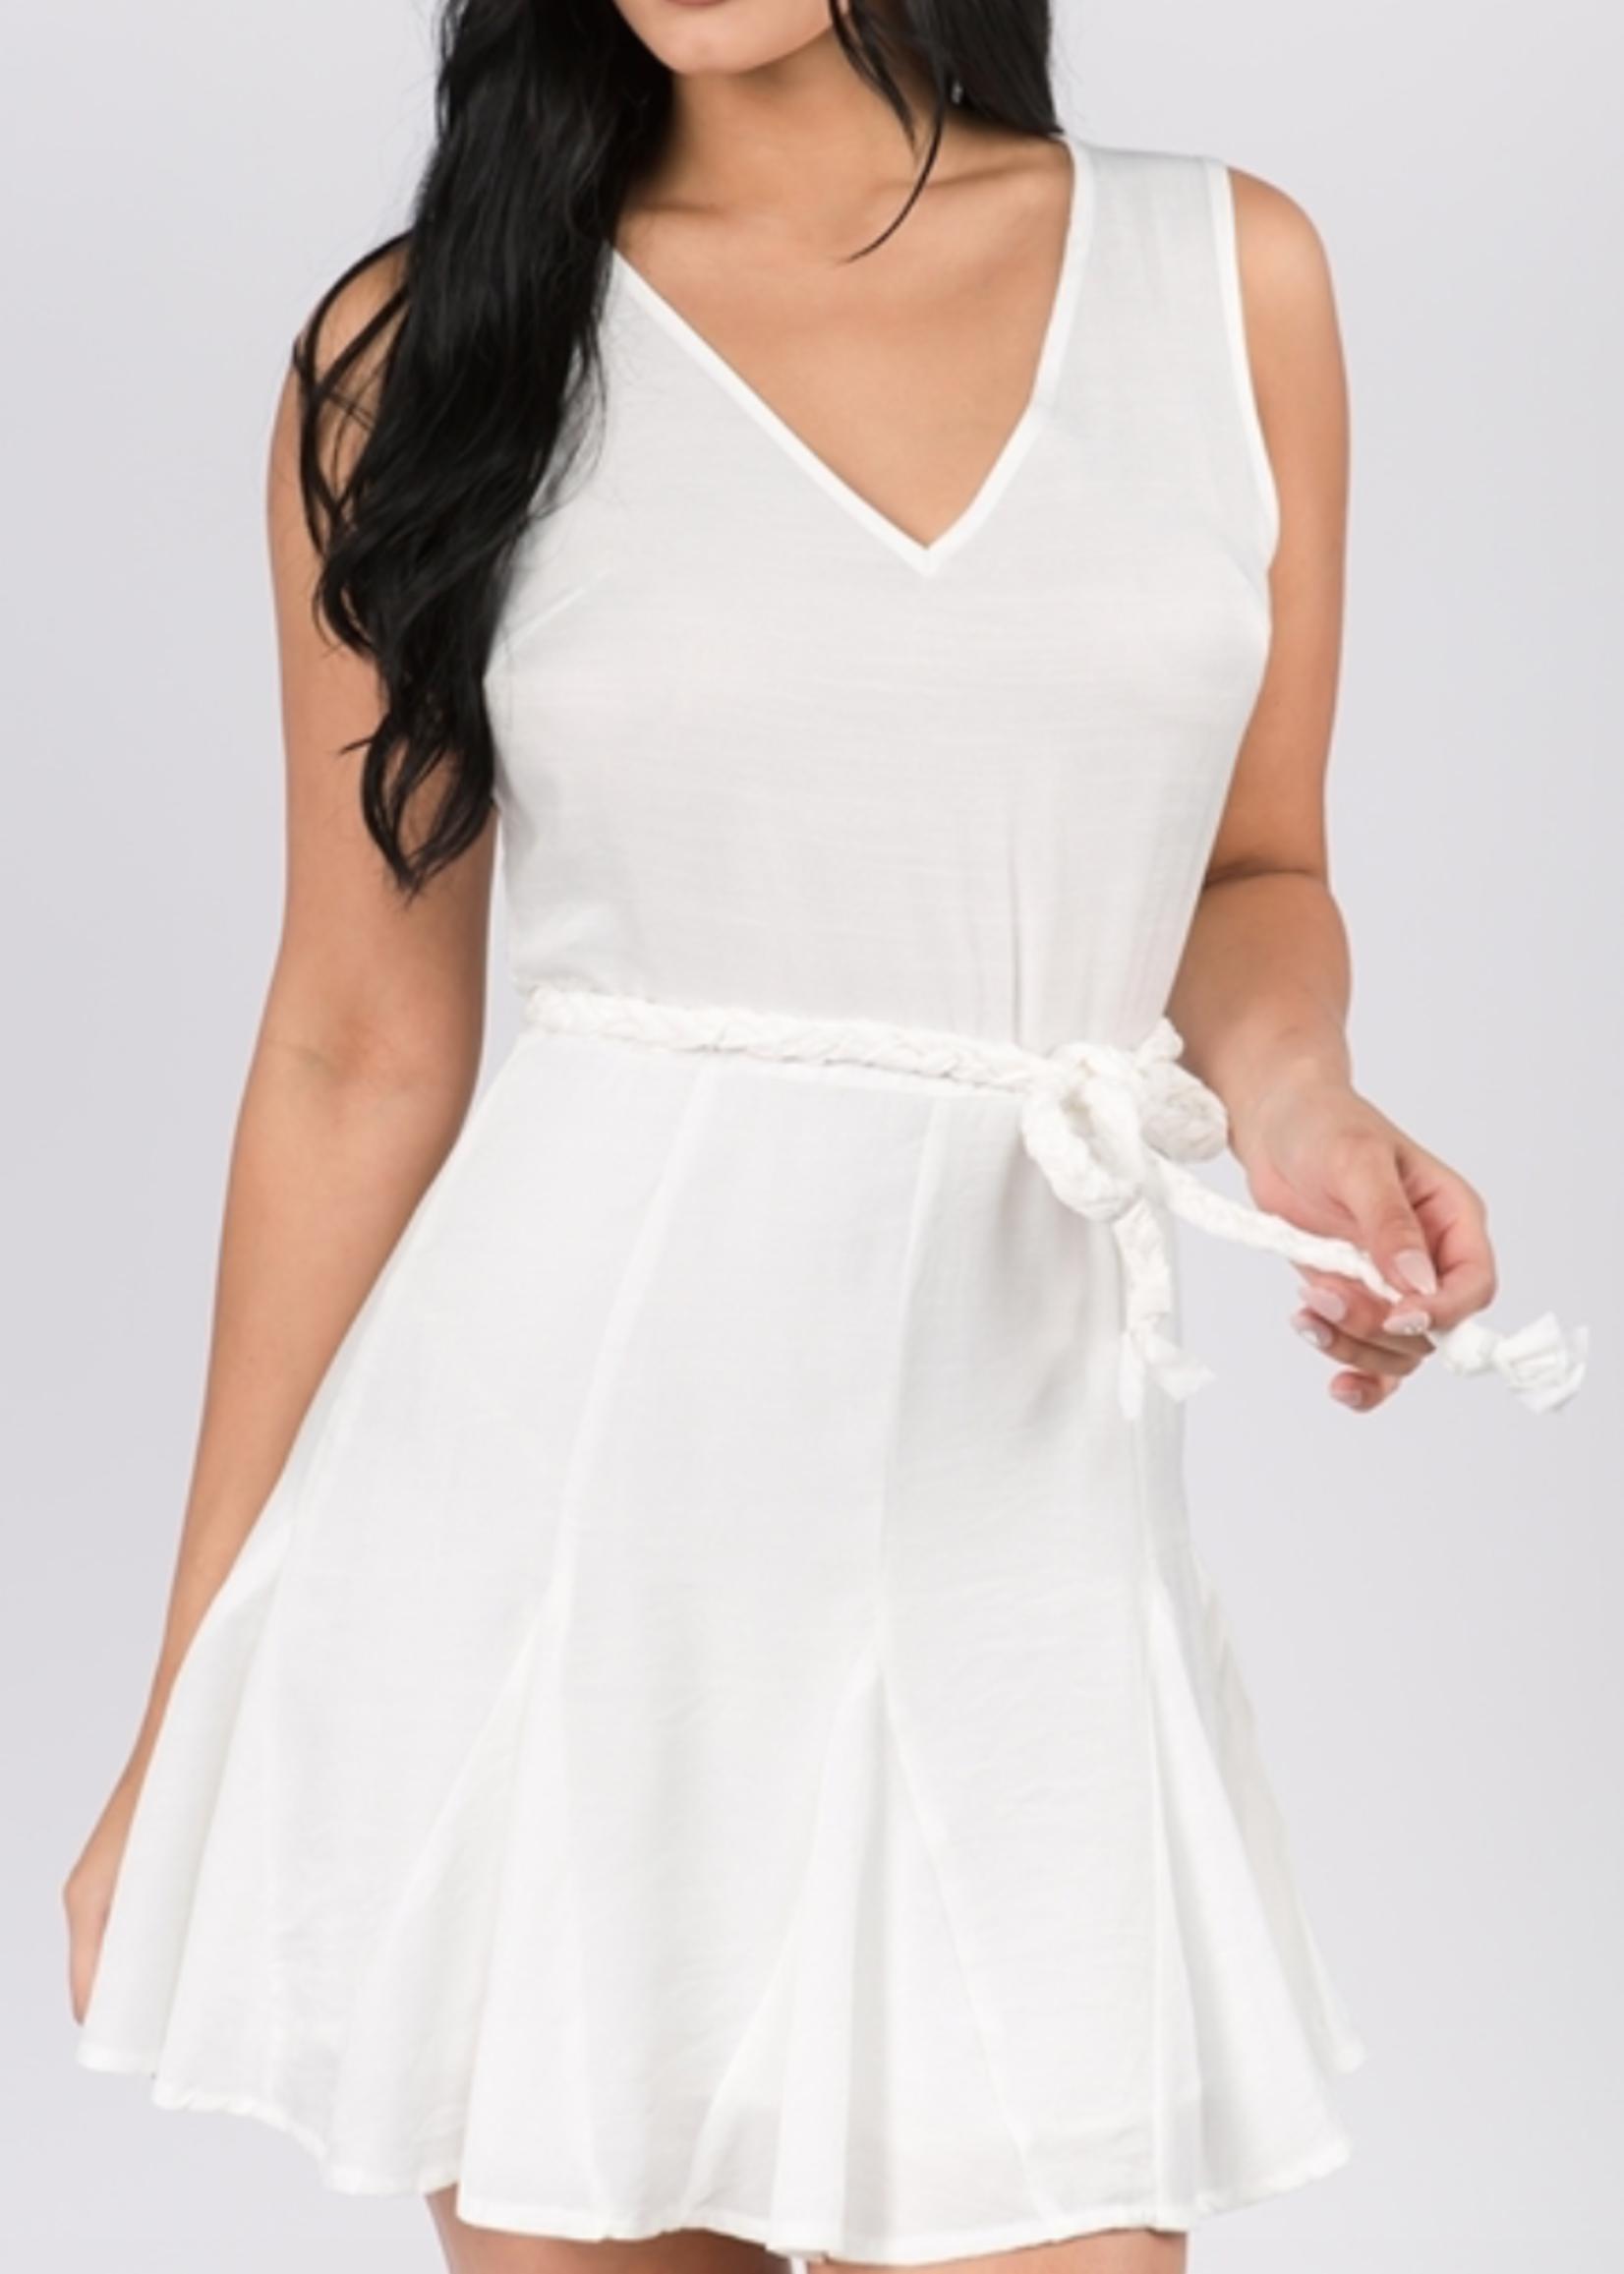 Fanco White Rope Tie Dress